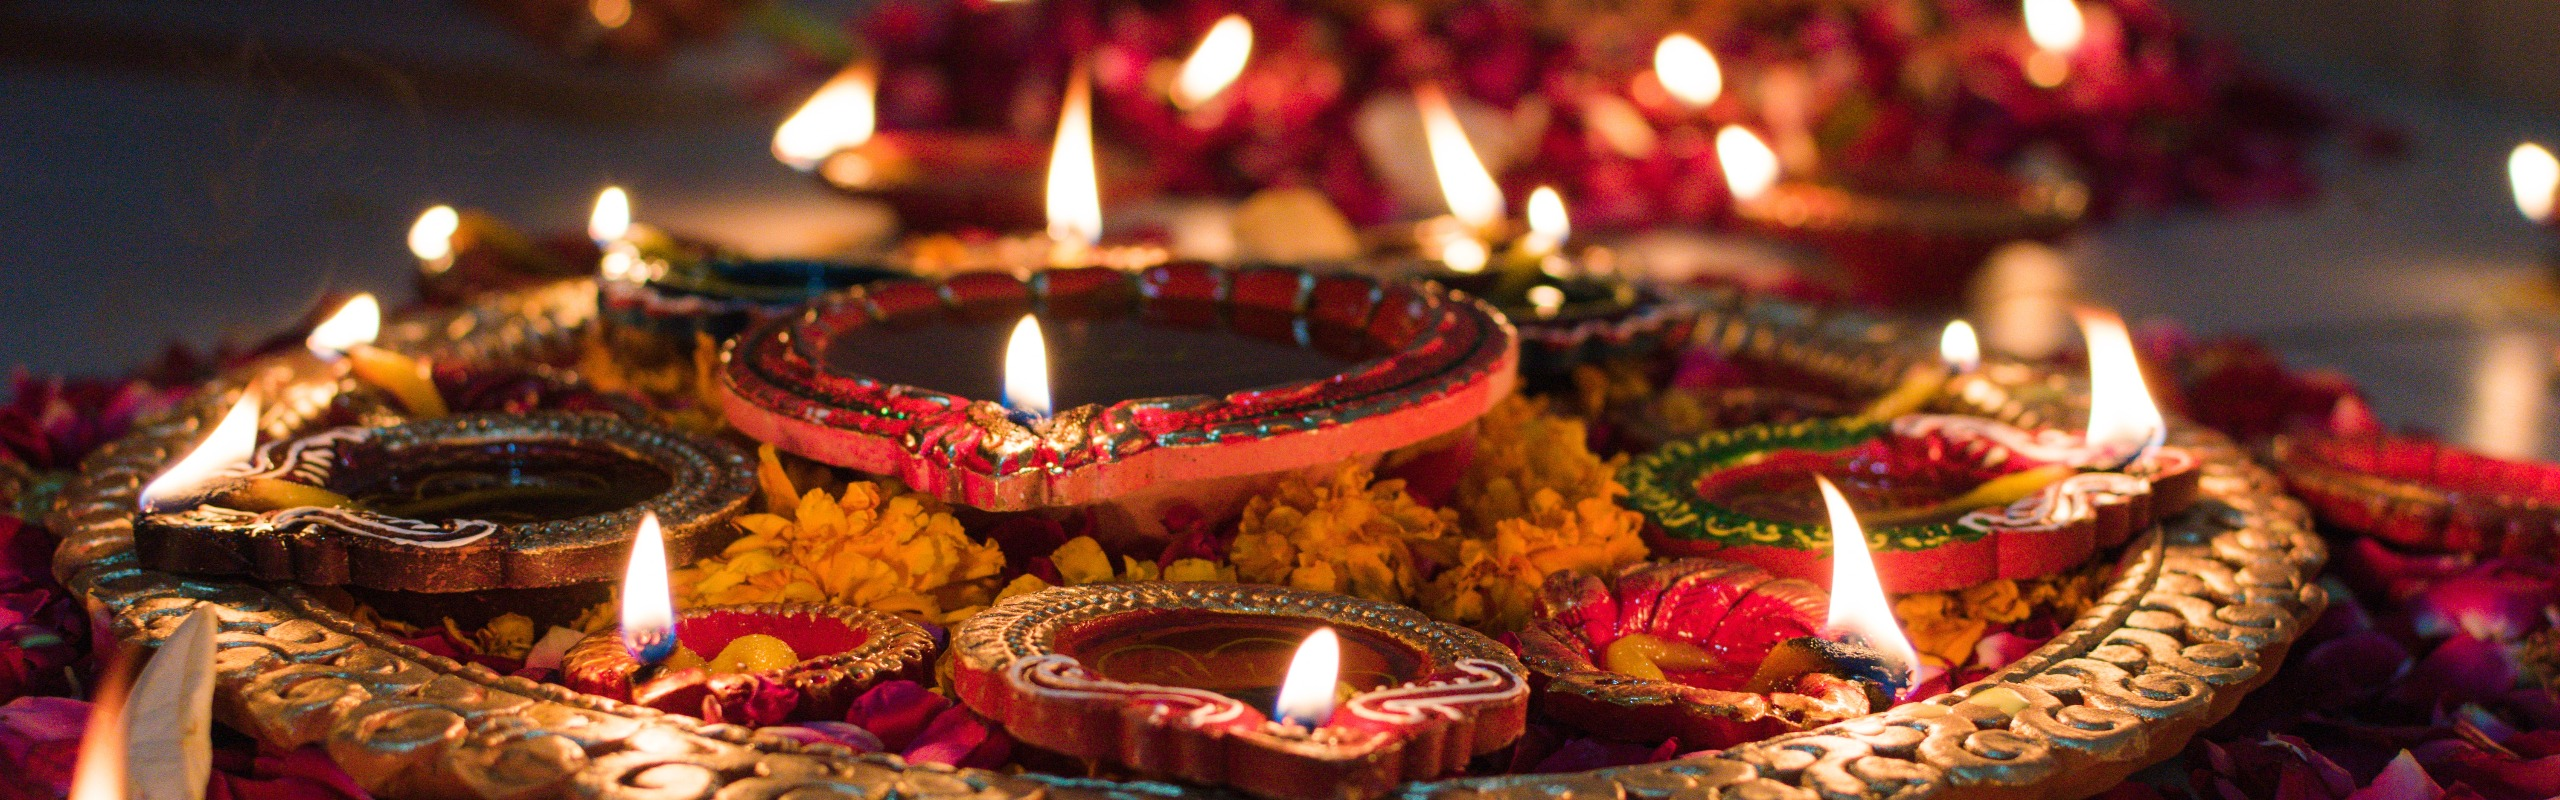 Top 8 Legends and Stories behind Diwali